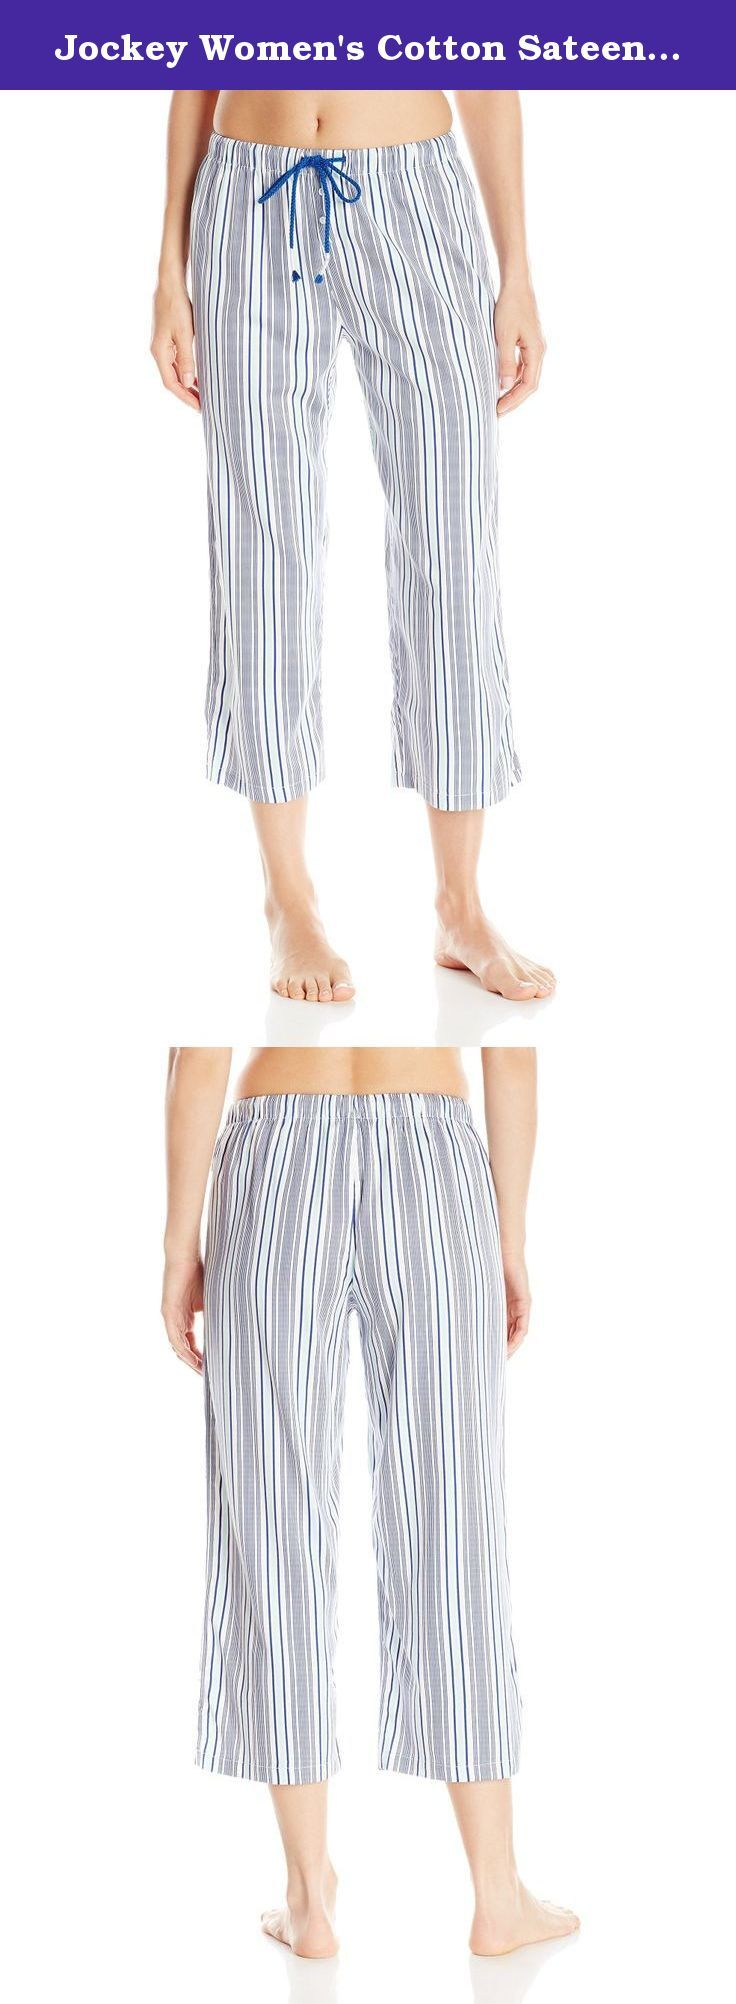 Jockey Women's Cotton Sateen Capri Pant, Woven Stripe, Small. Designed for effortless comfort, the Jockey cotton sateen capri pant is a classic favorite for sleep or lounge.